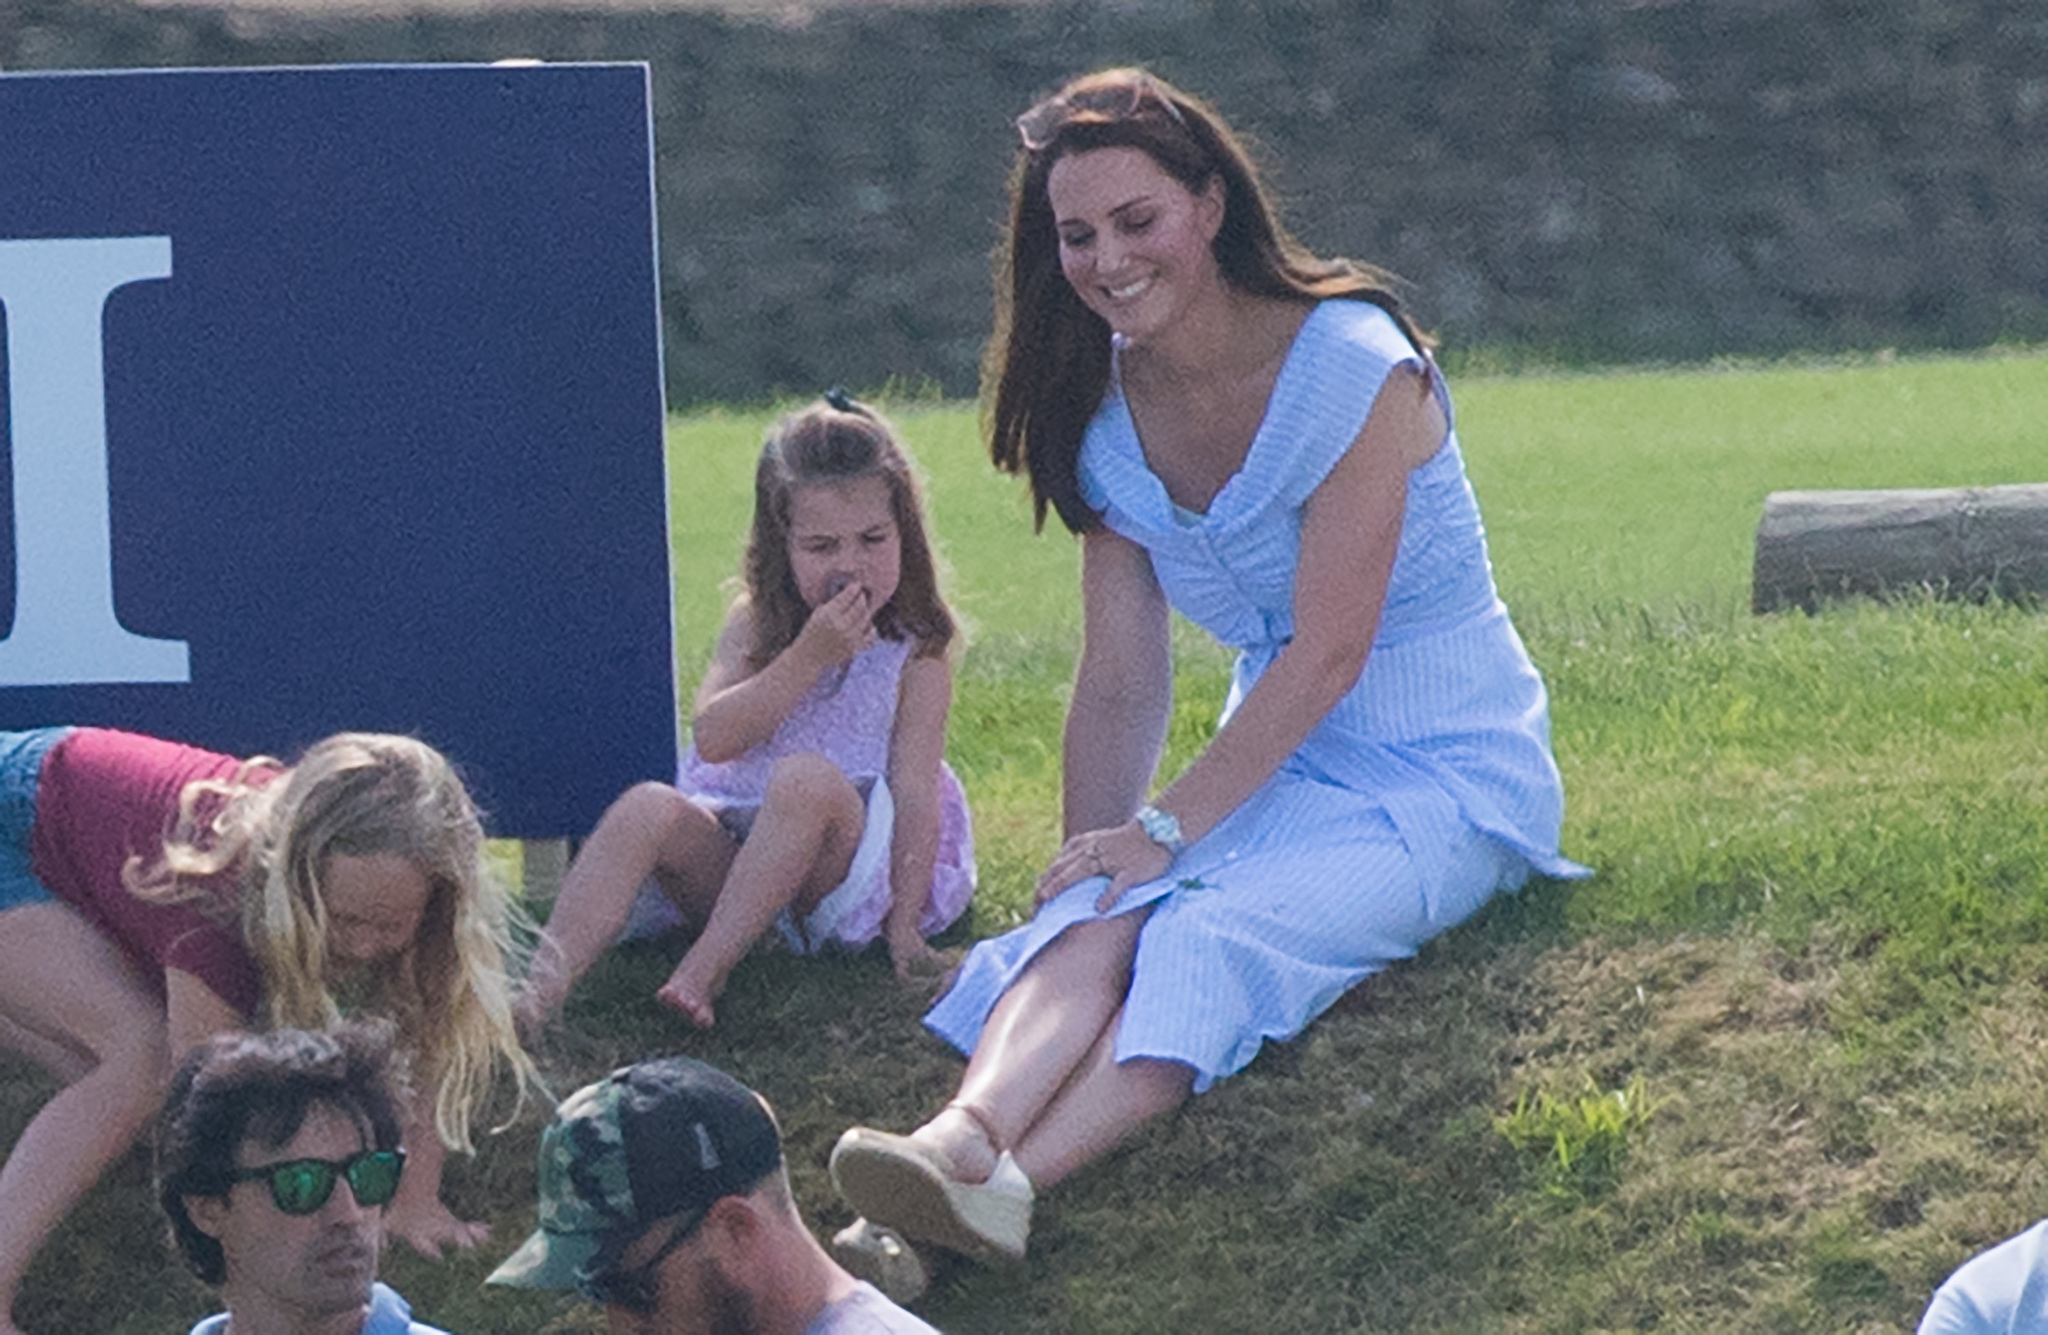 Kate Middleton con un vestido midi de Zara durante una jornada de polo...